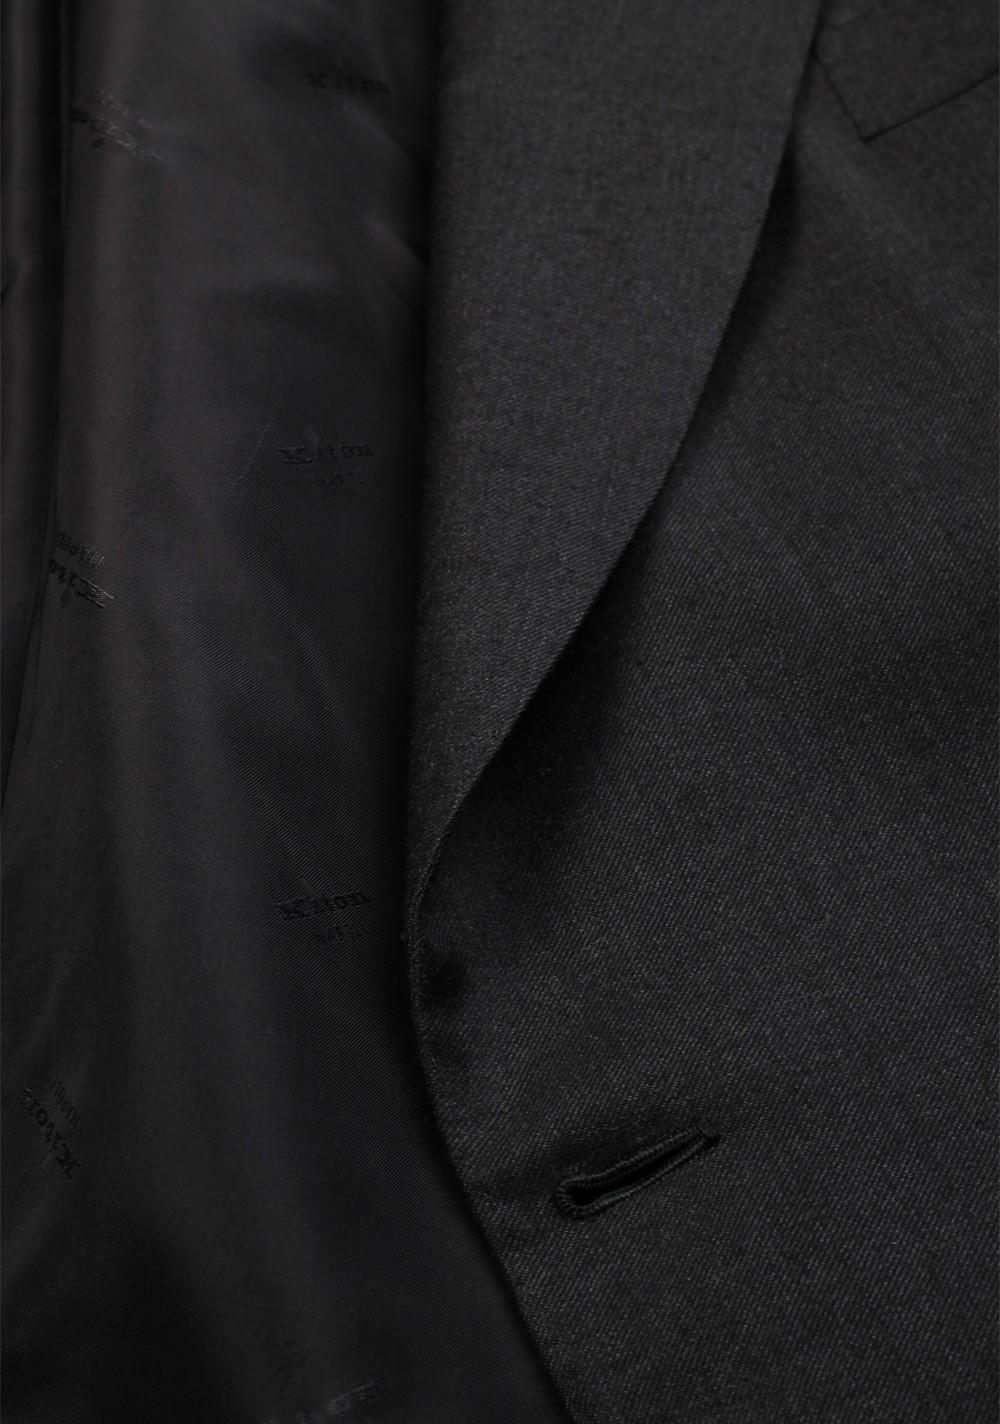 Double Breasted Suit Size 54L / 44L Long U.S. 100% Cashmere ...